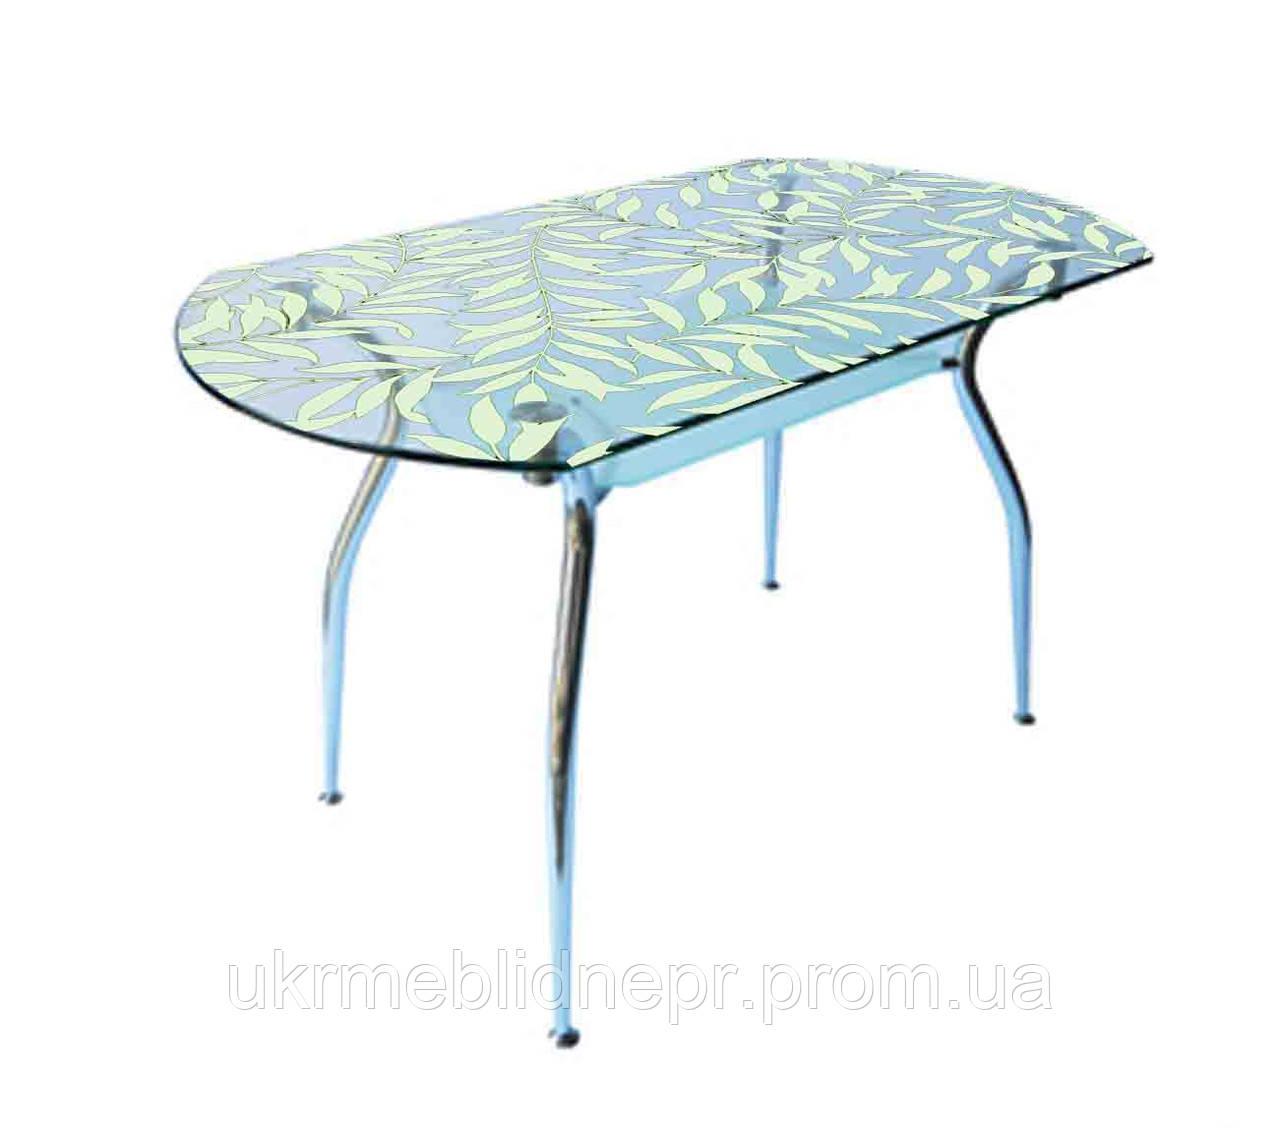 Обеденный стол Кристал